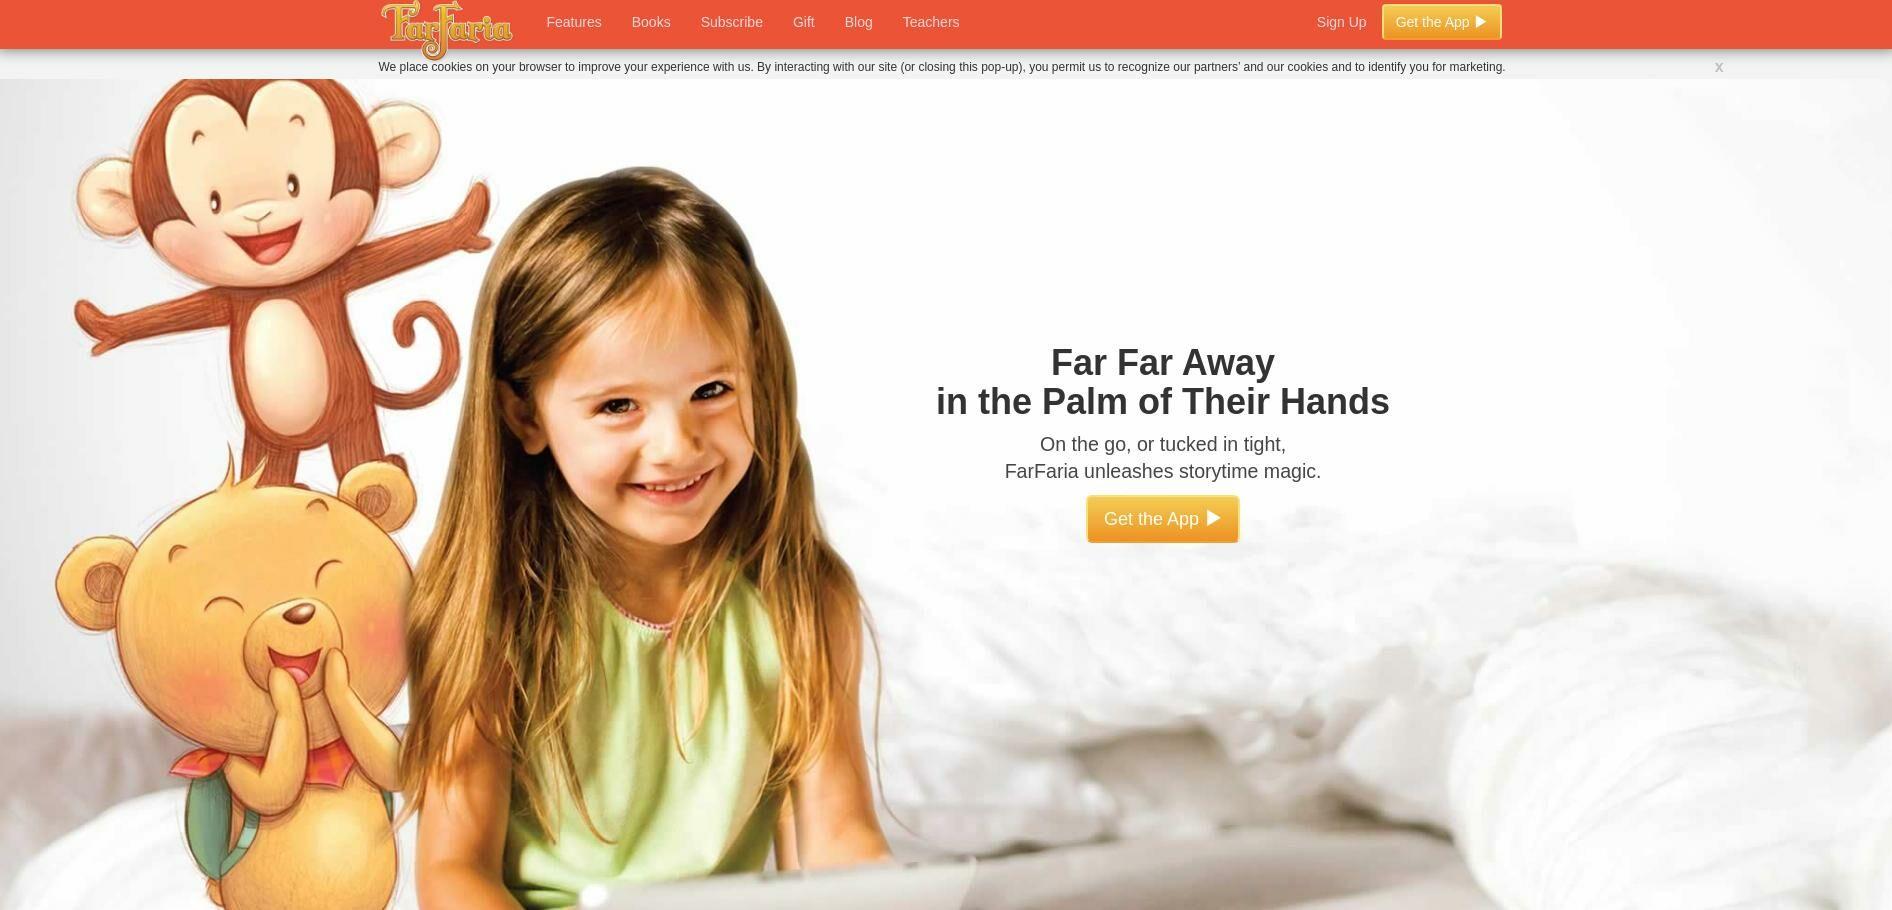 FarFaria for kids